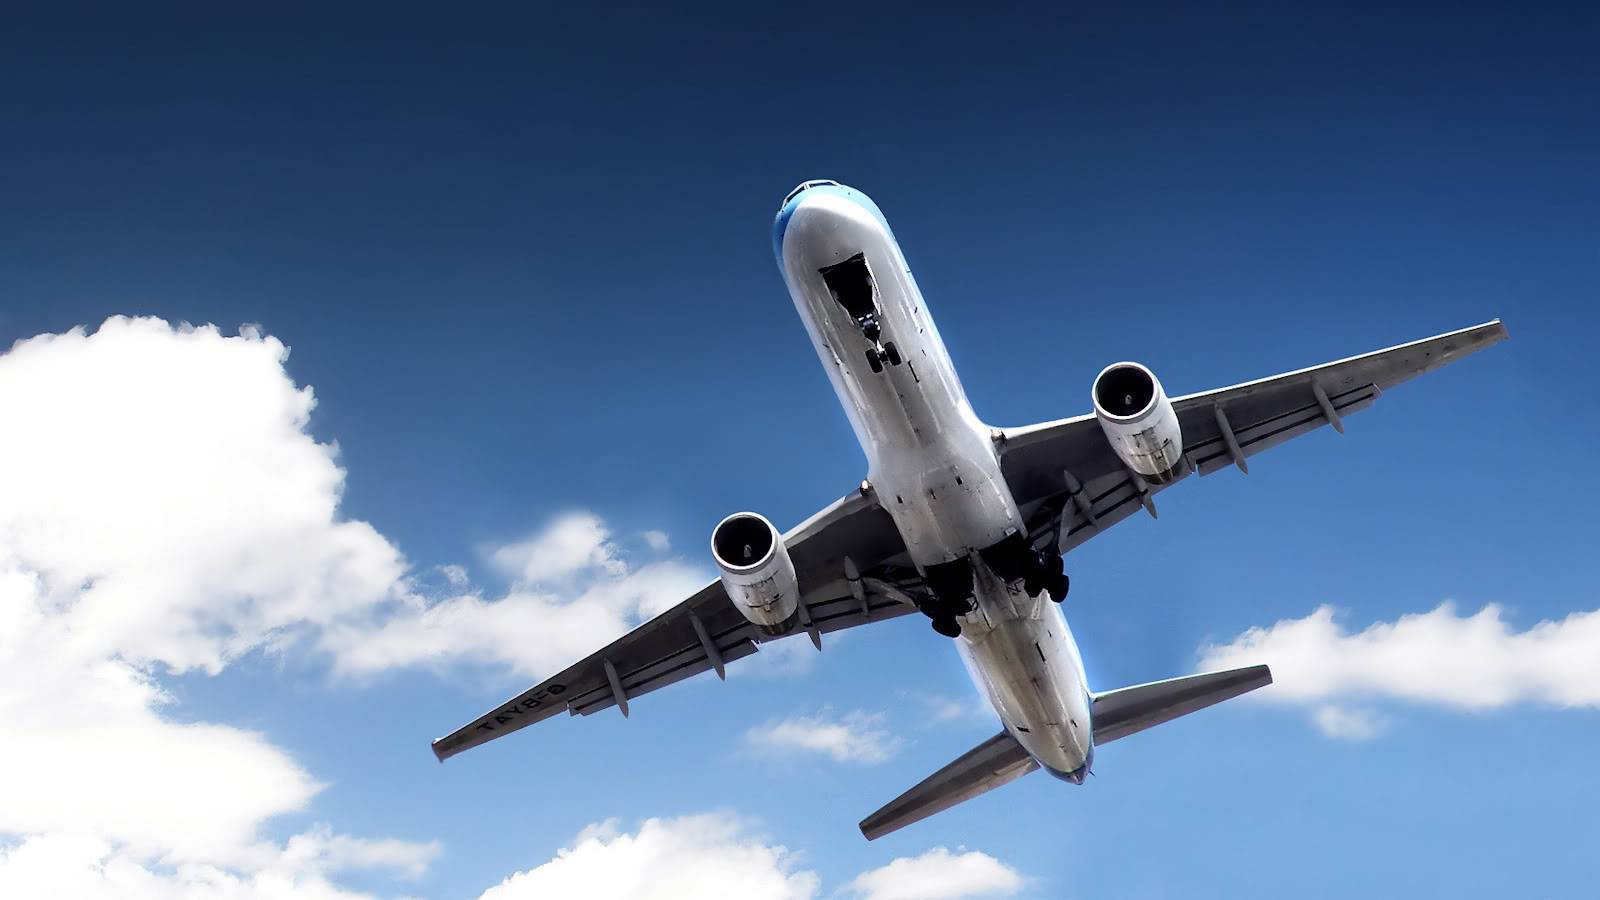 Airplane | 飛行機 | Máy bay Airplane-travel-wallpaper